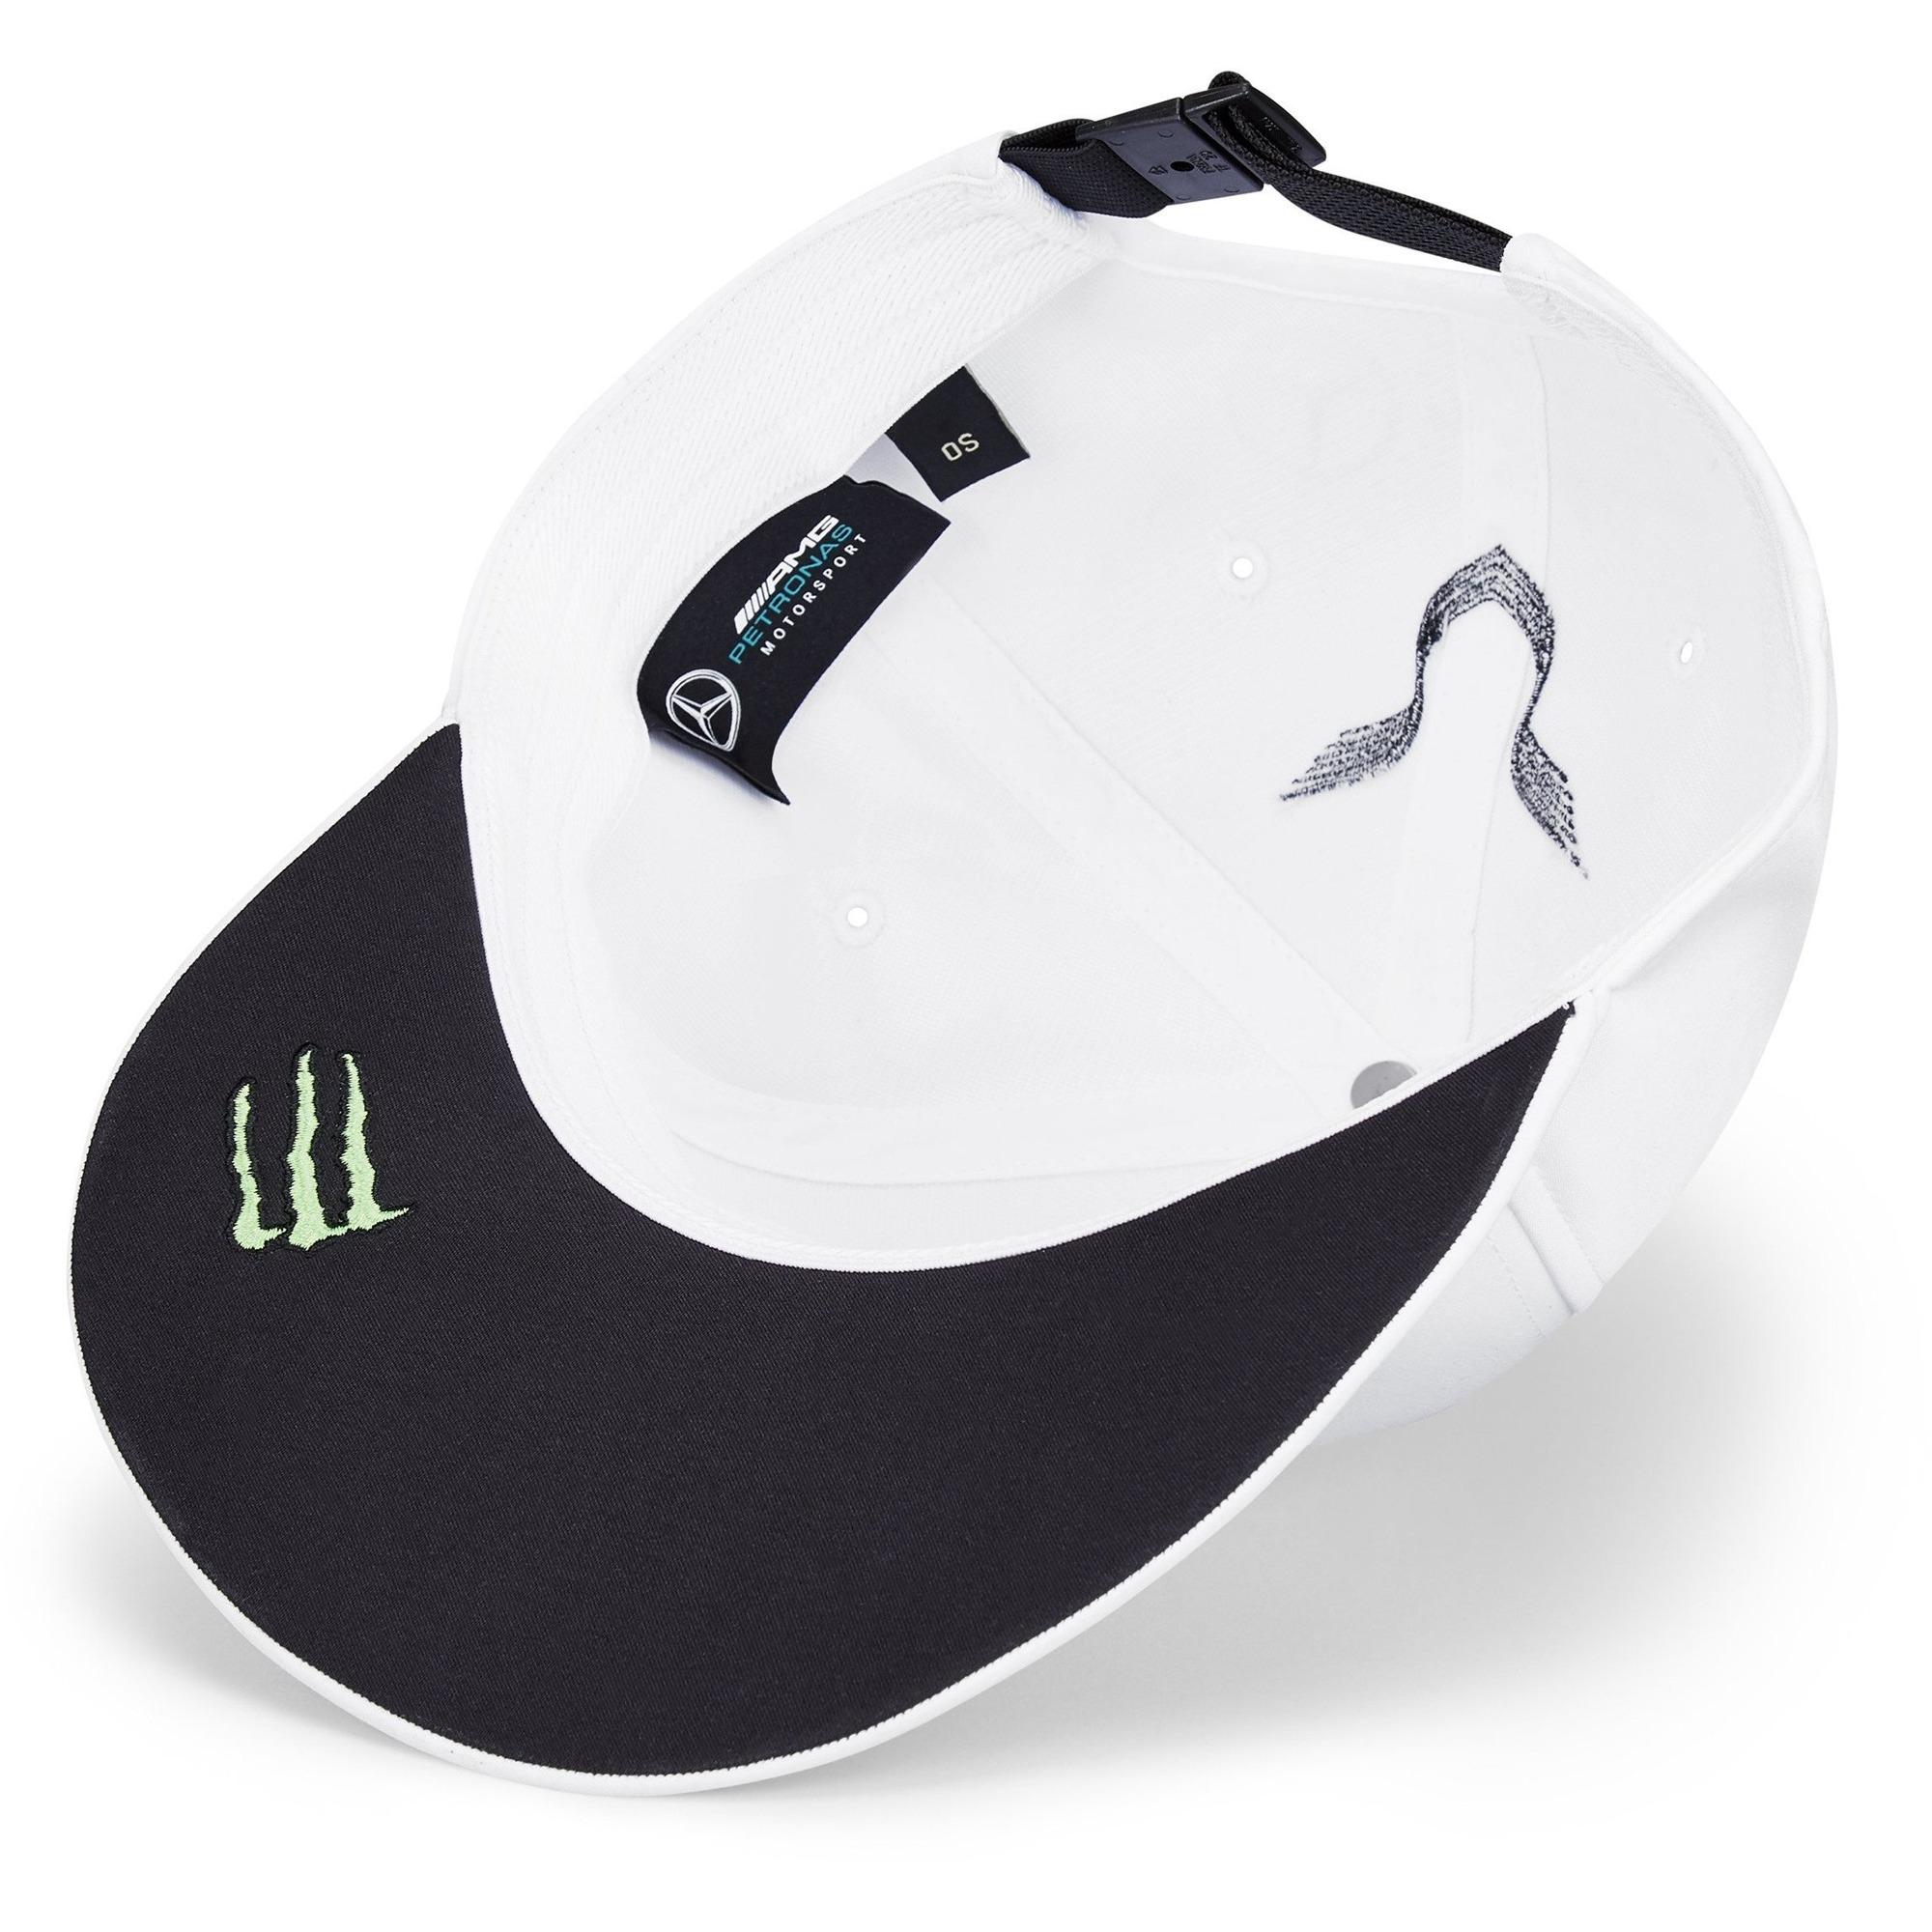 NEW 2019 Mercedes AMG F1 Adults Lewis Hamilton Baseball Cap Hat  R2